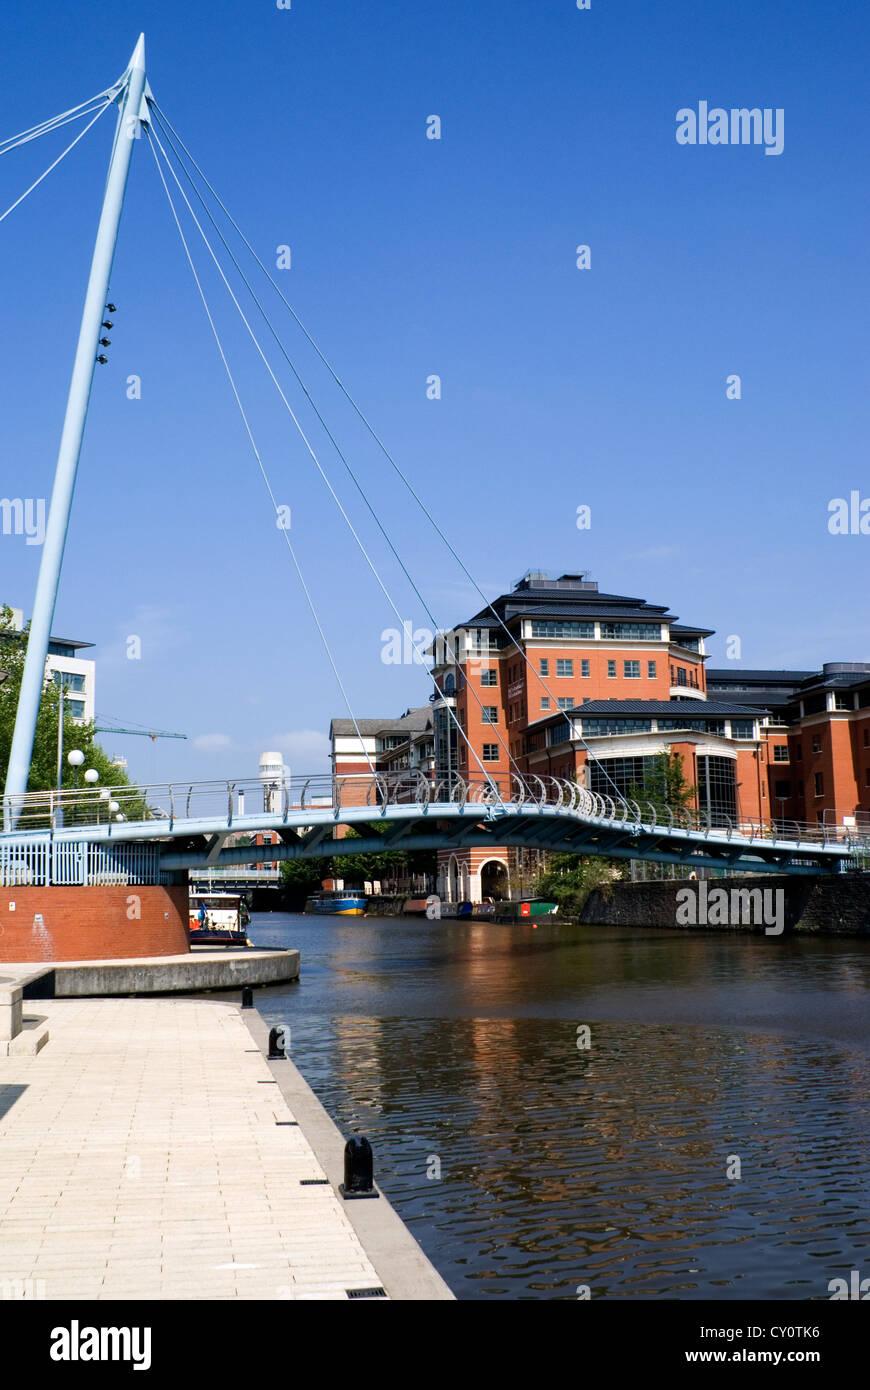 barges bridge and modern buildings temple quay bristol city centre england - Stock Image